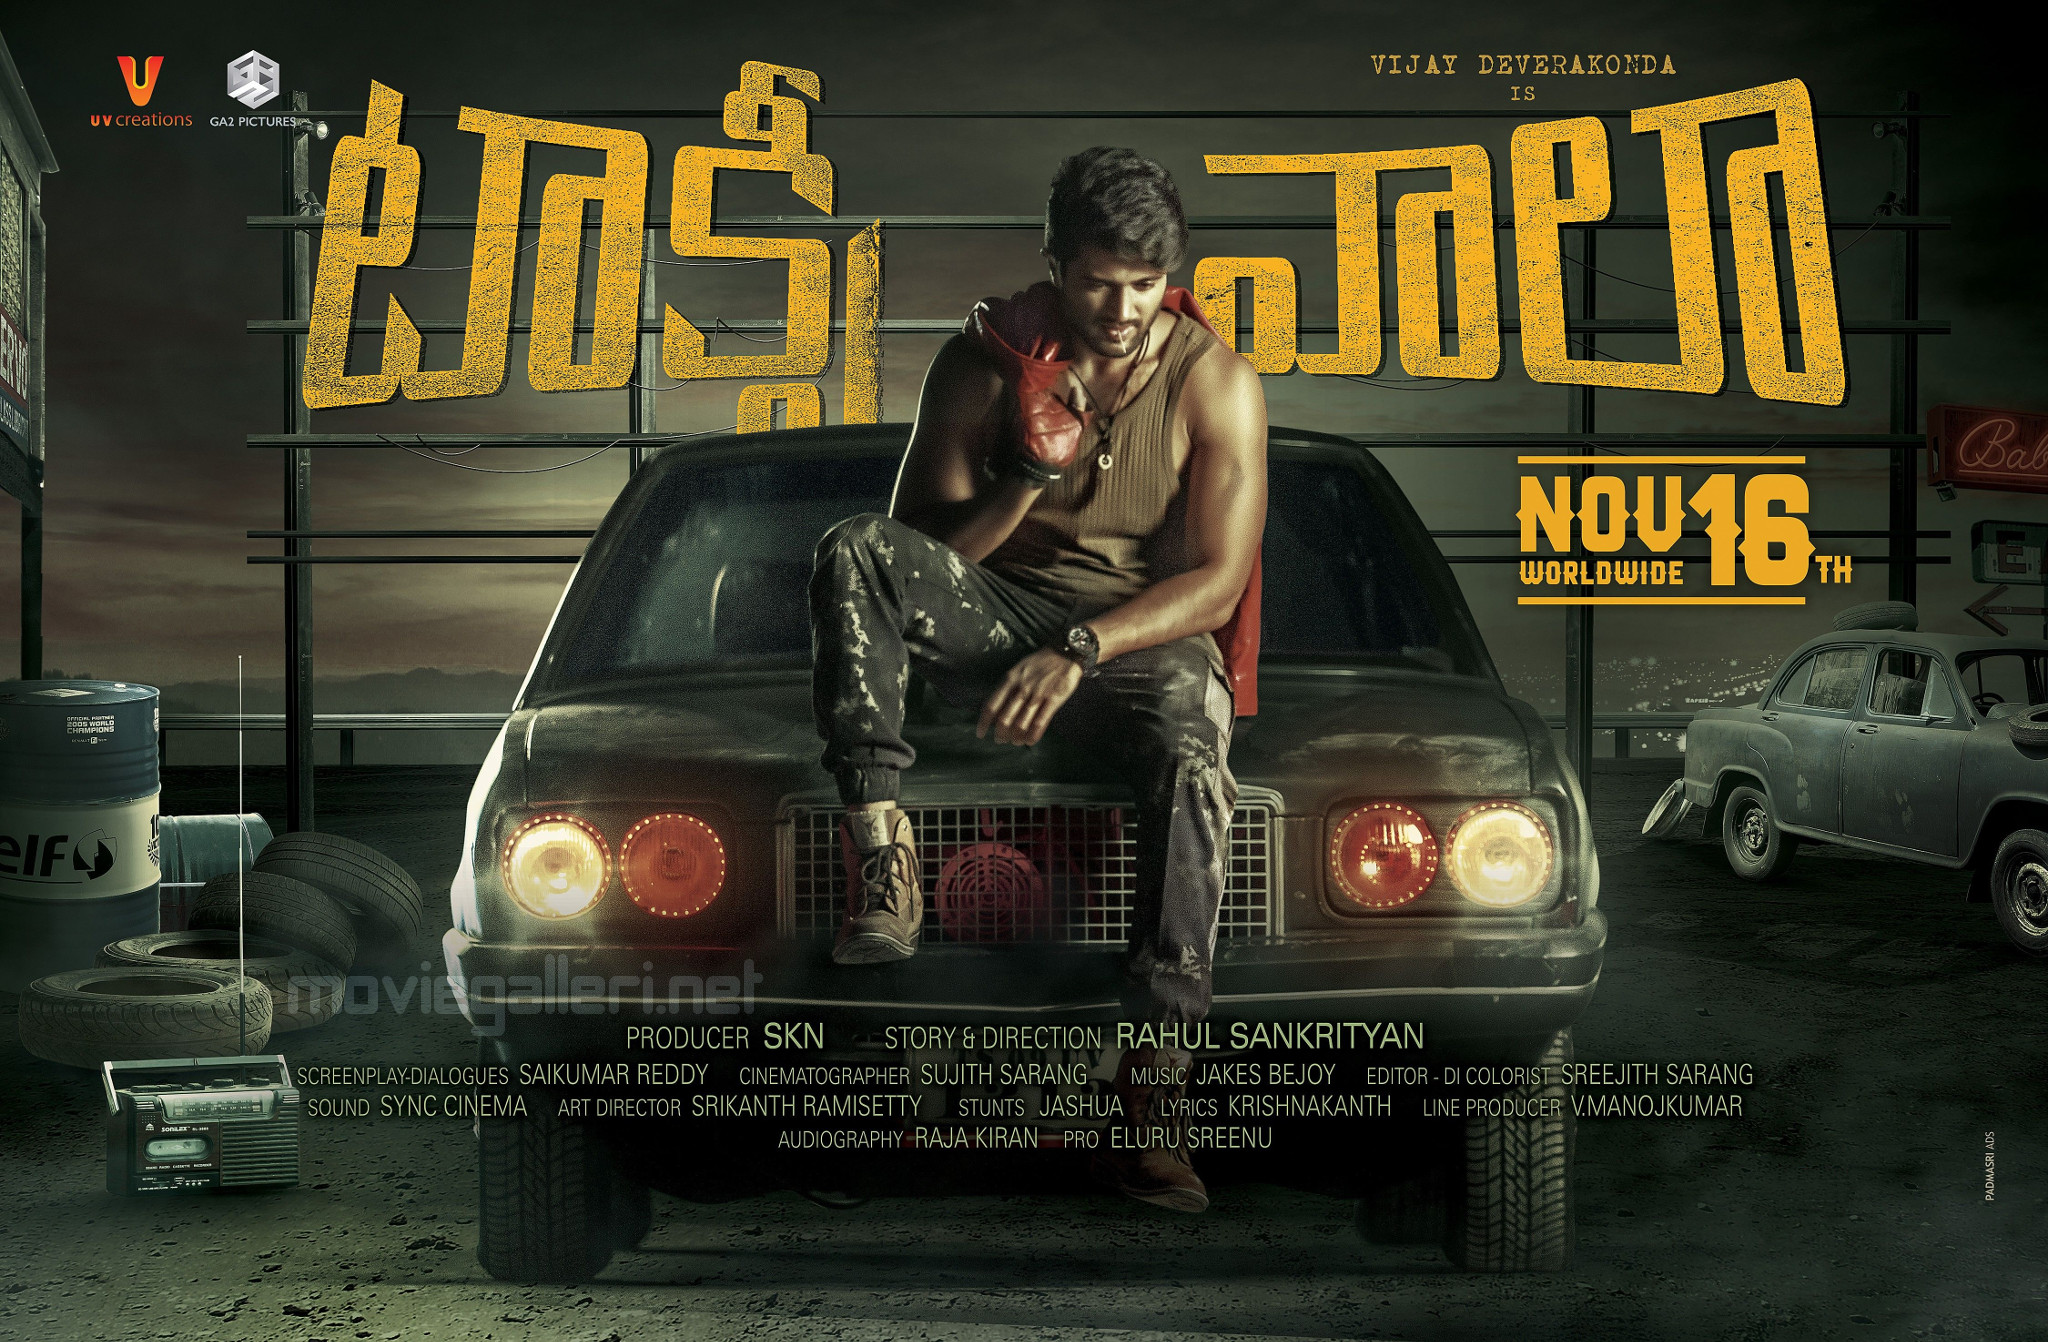 Hero Vijay Devarakonda Taxiwala Movie Release Date on 16 November Wallpaper HD